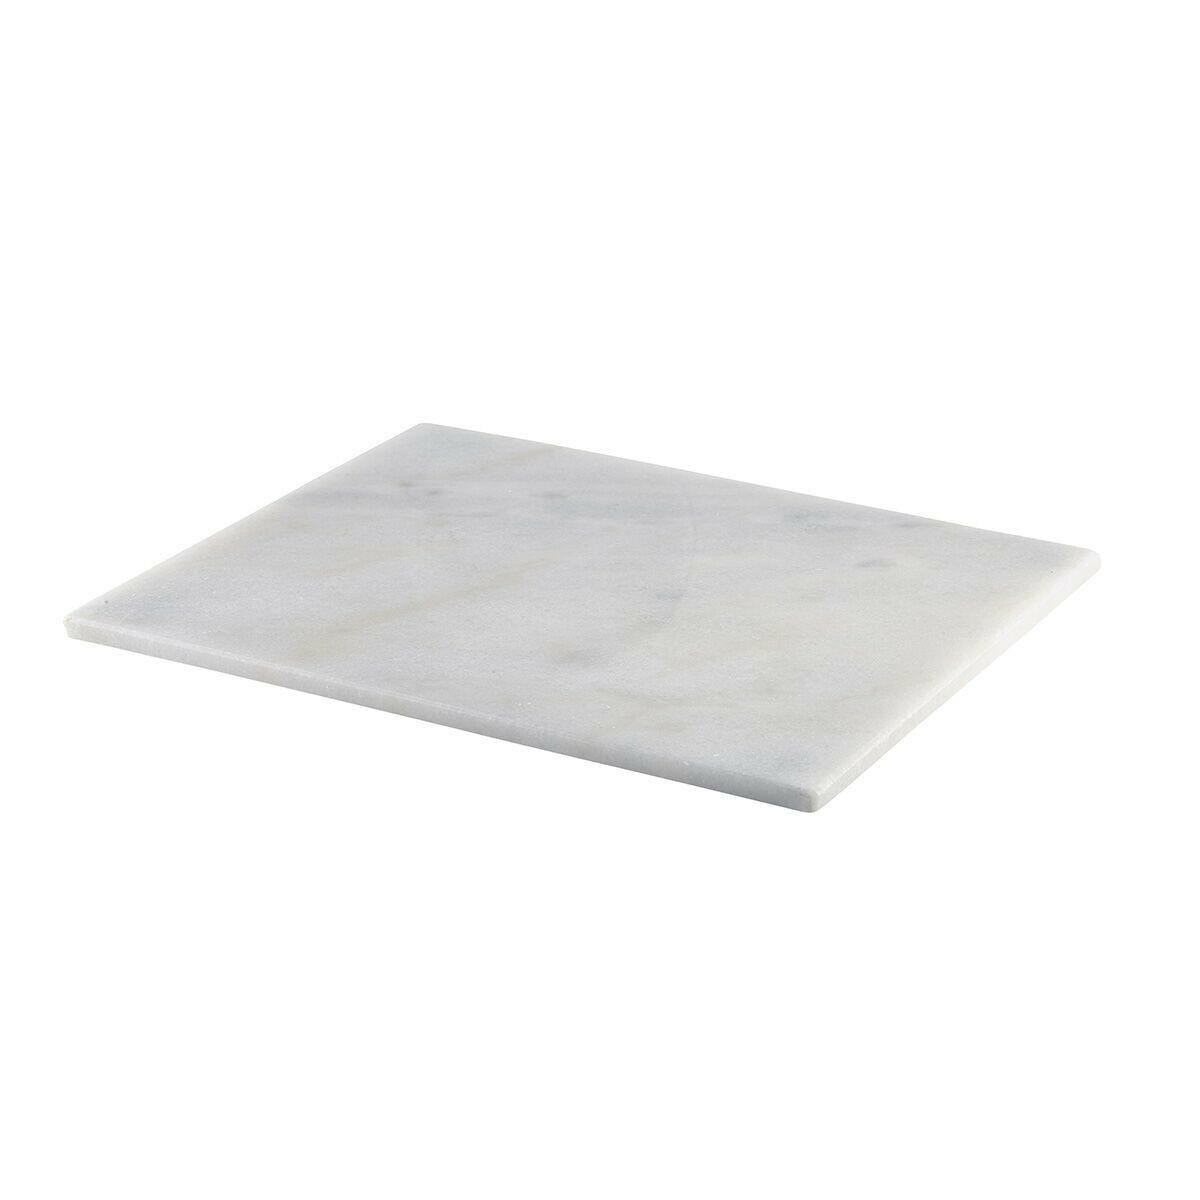 wit marmeren plateau GN 1/2 32 x 26 cm met voetjes